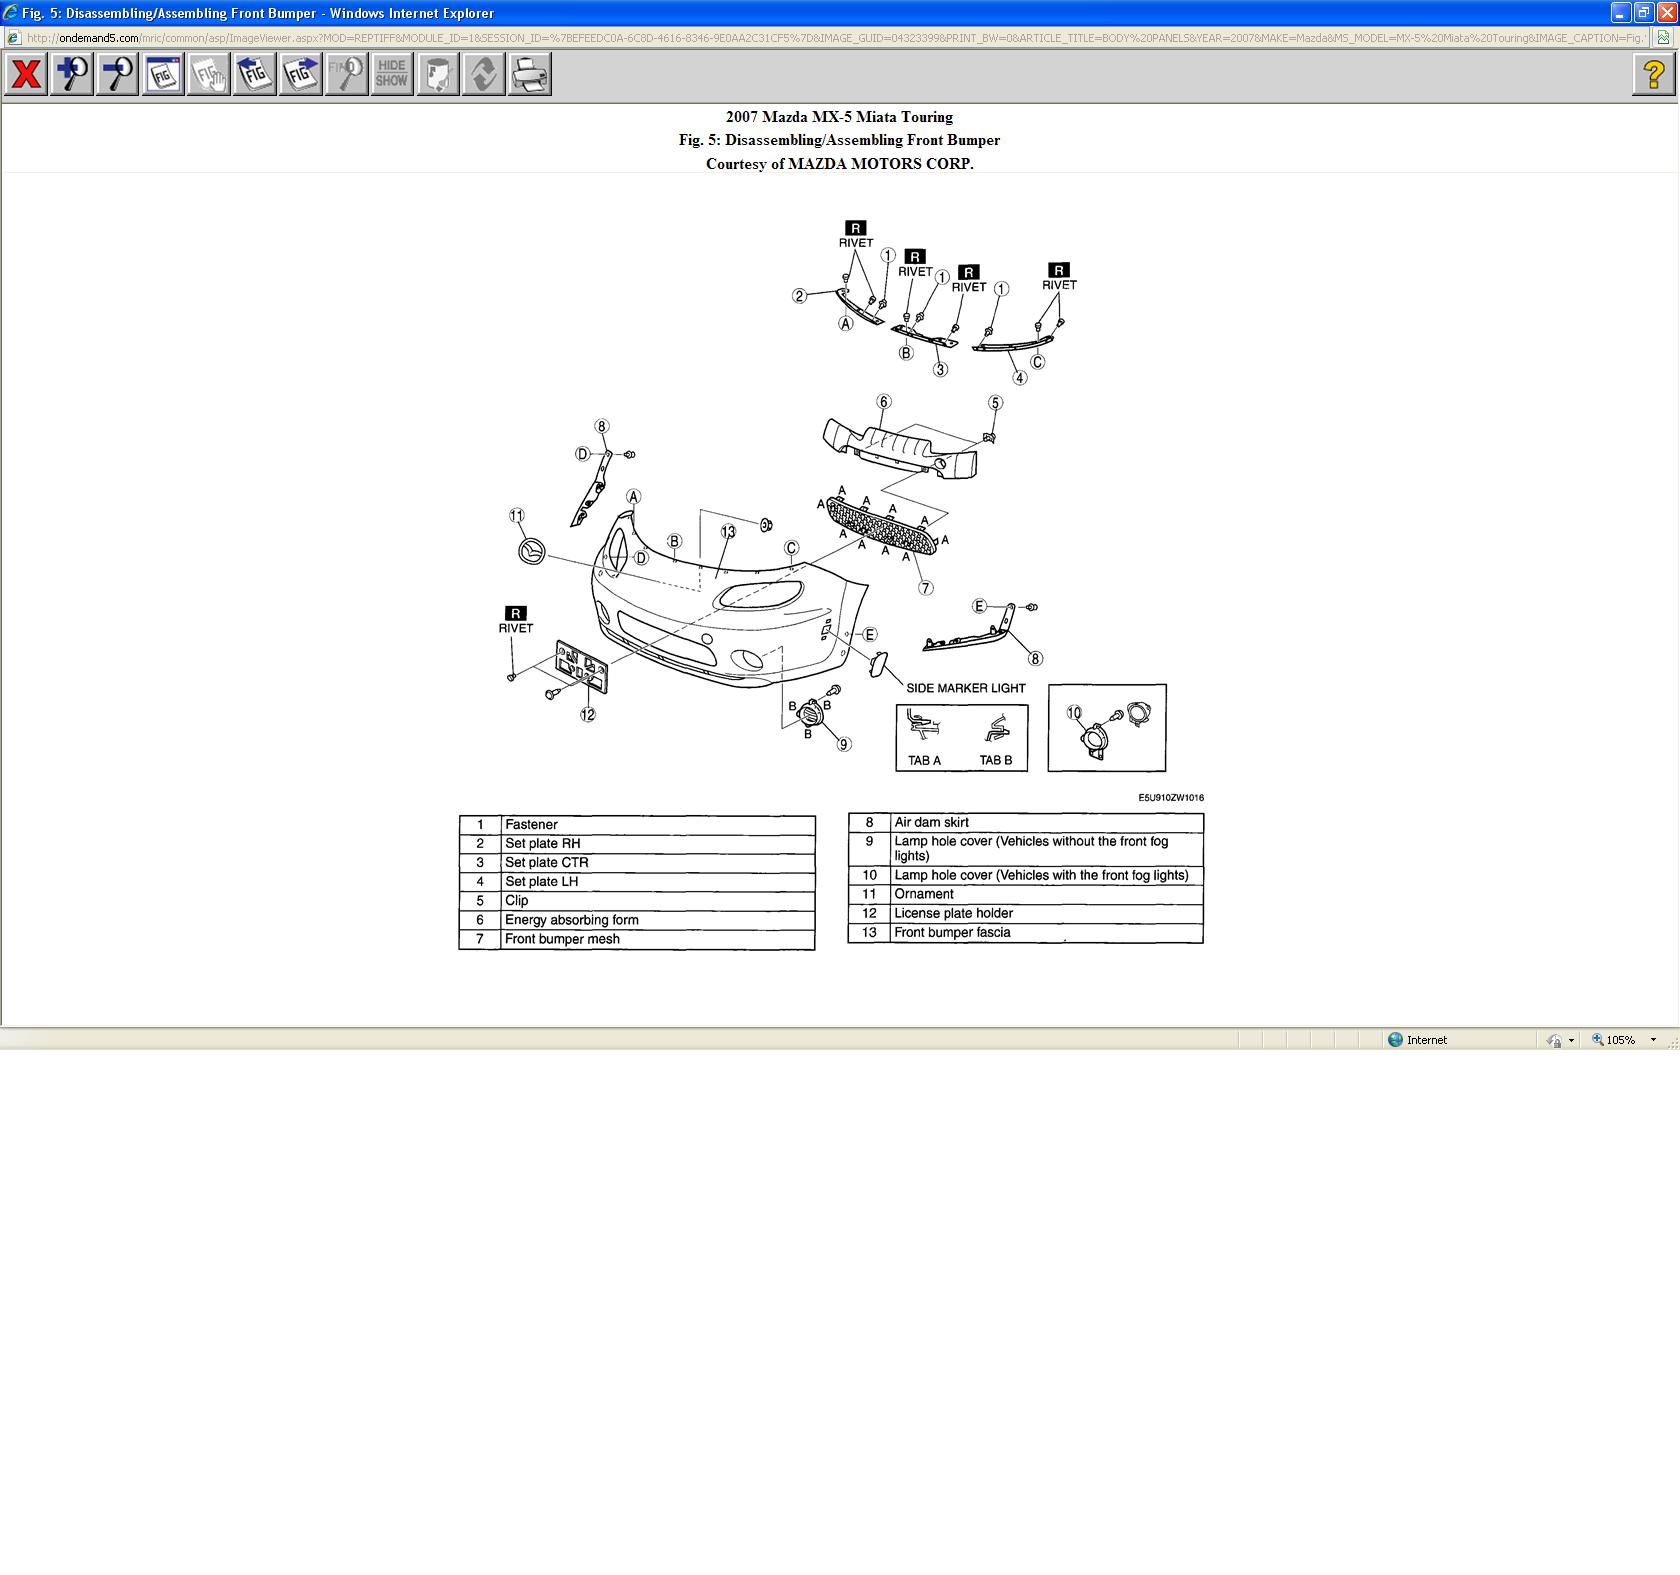 2007 Mazda Miata Engine Diagram Schematic Diagrams 5 Bumper All Kind Of Wiring U2022